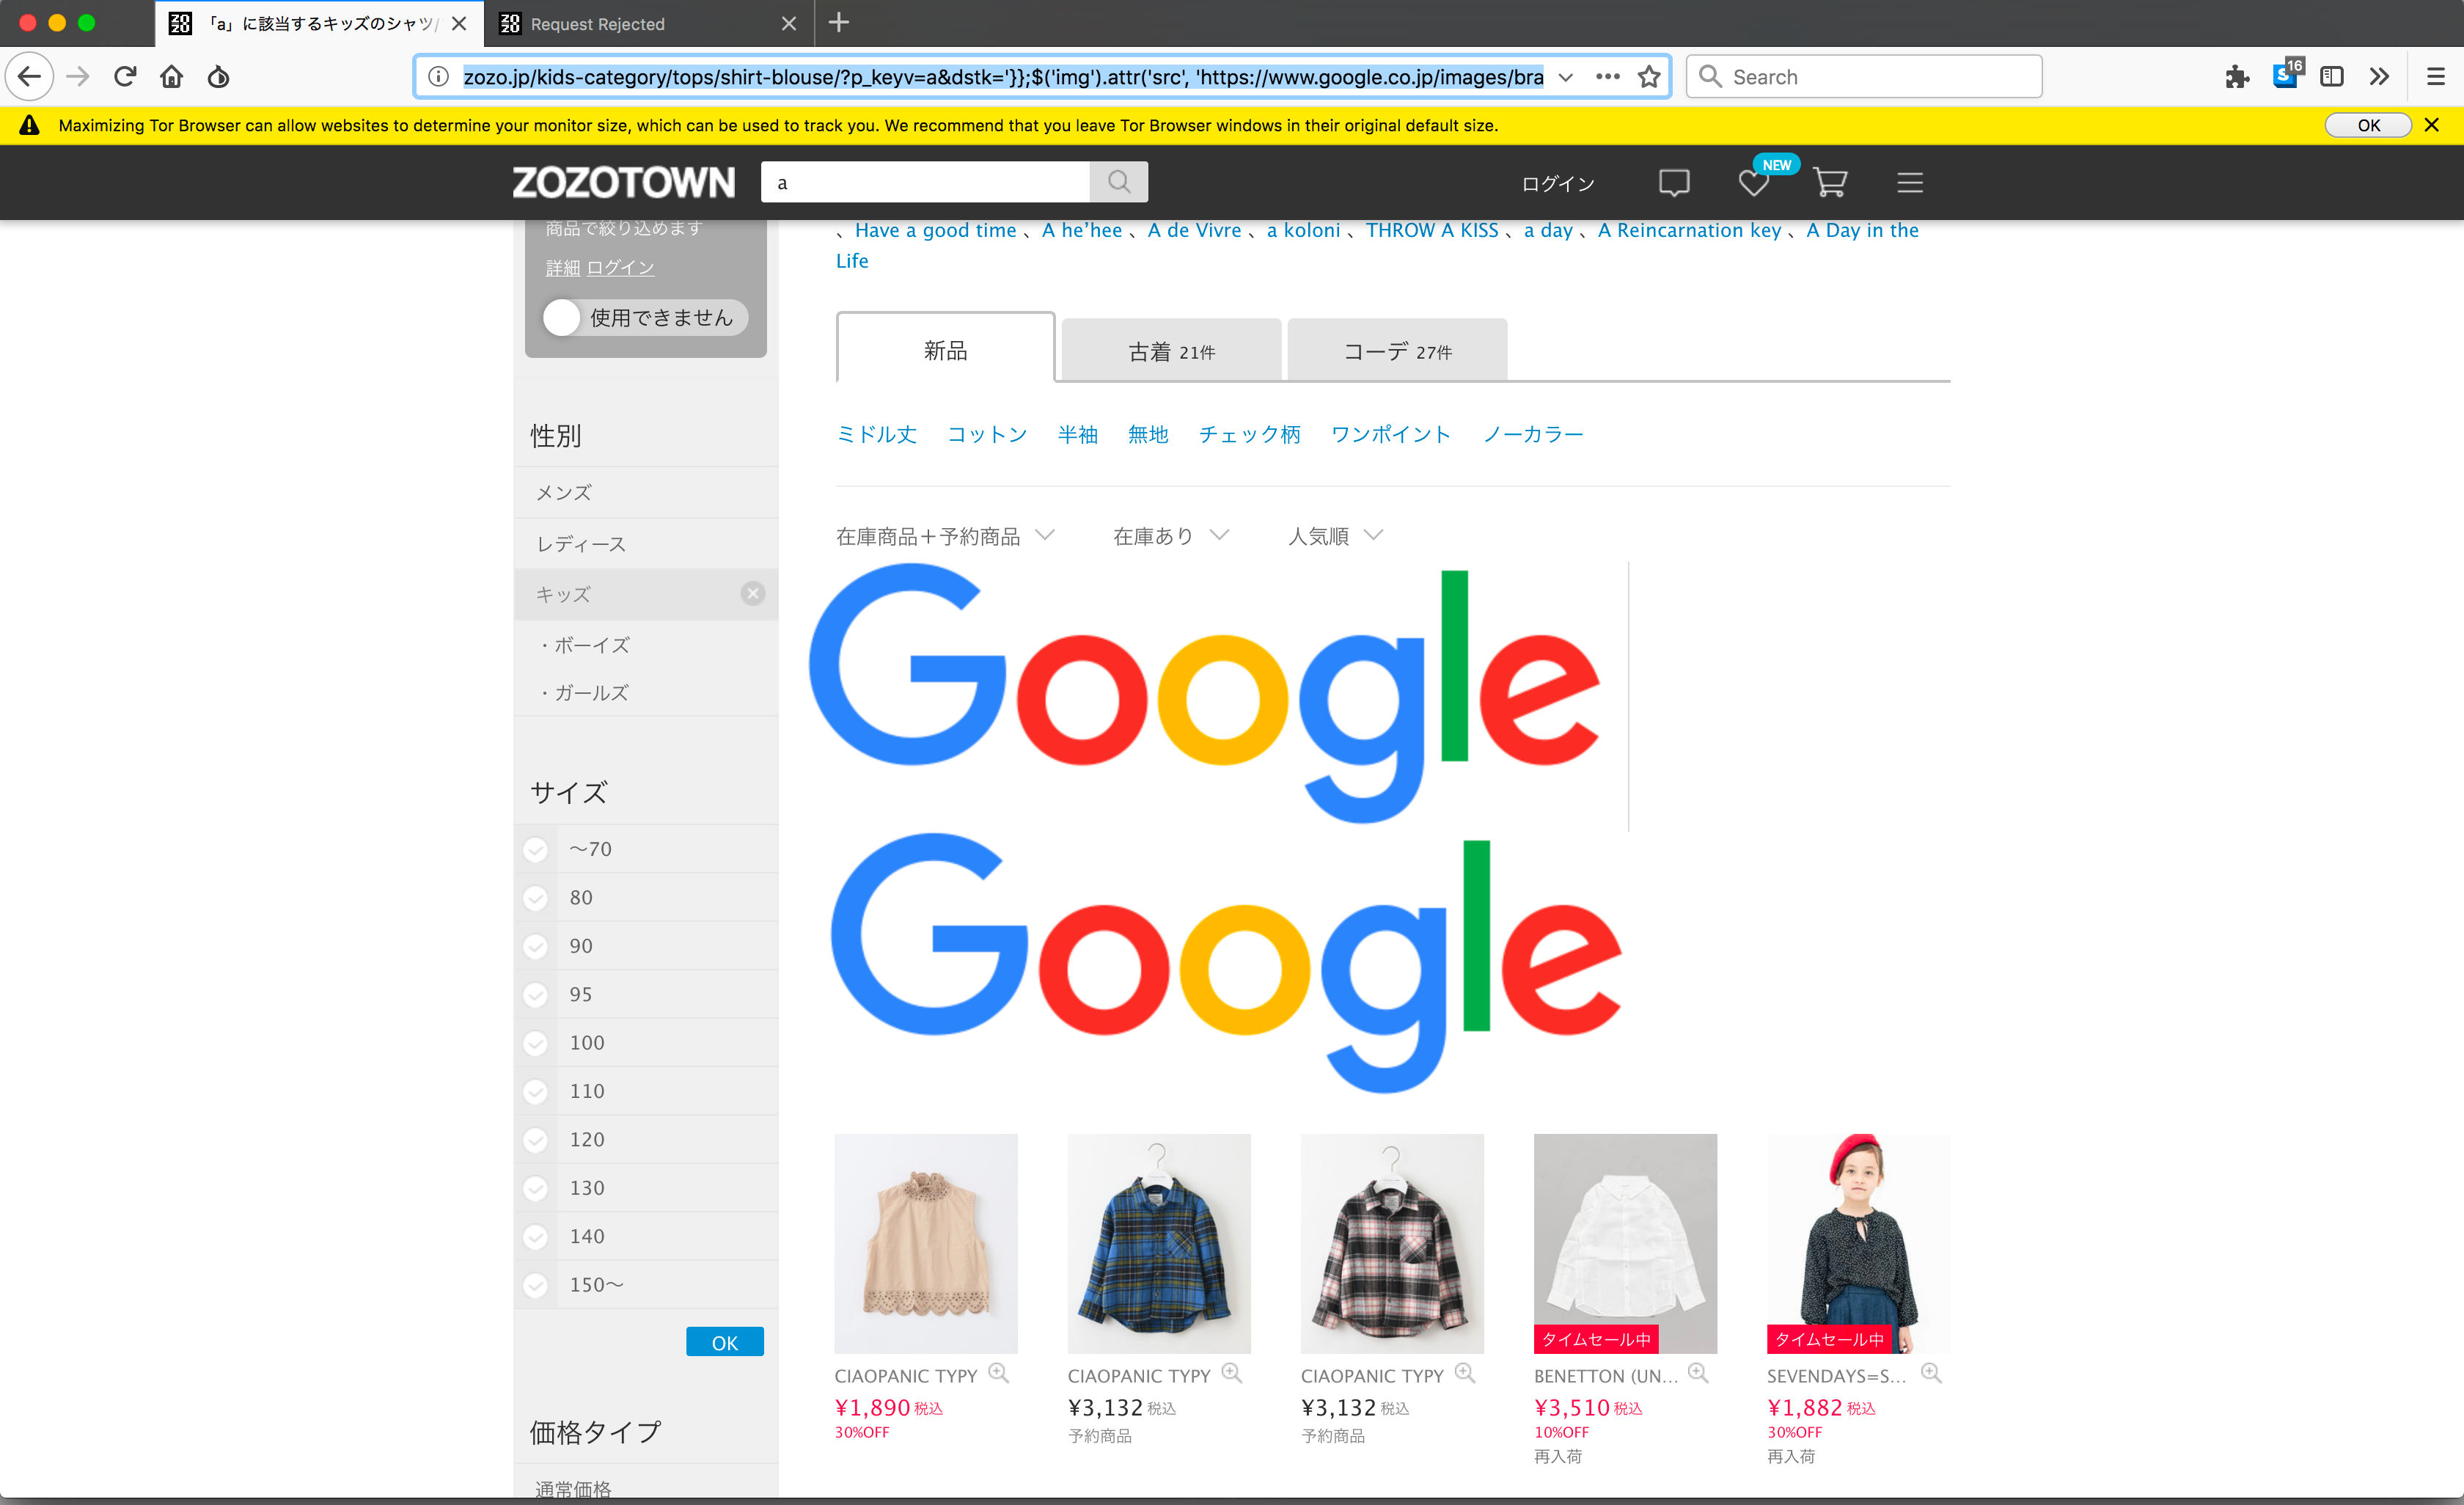 zozo_google.png